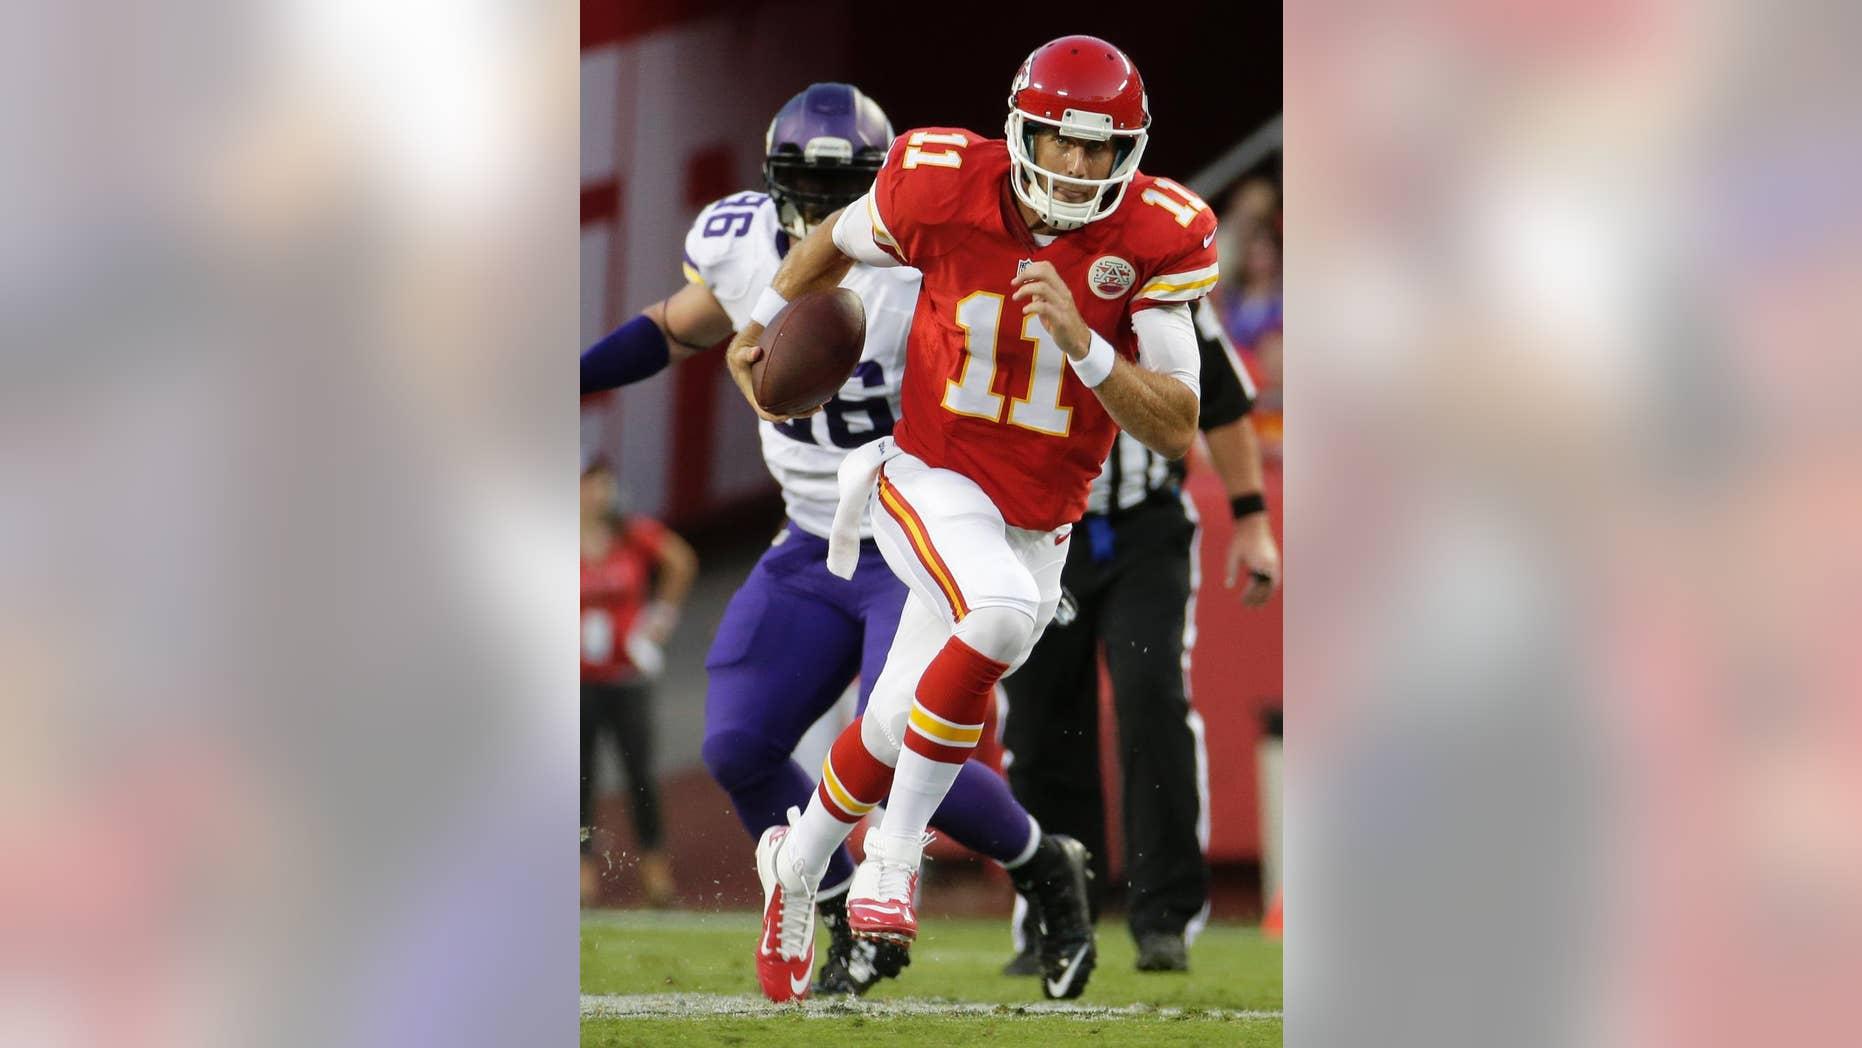 Kansas City Chiefs quarterback Alex Smith (11) runs past Minnesota Vikings defensive end Brian Robison during the first half of an NFL preseason football game in Kansas City, Mo., Saturday, Aug. 23, 2014. (AP Photo/Charlie Riedel)